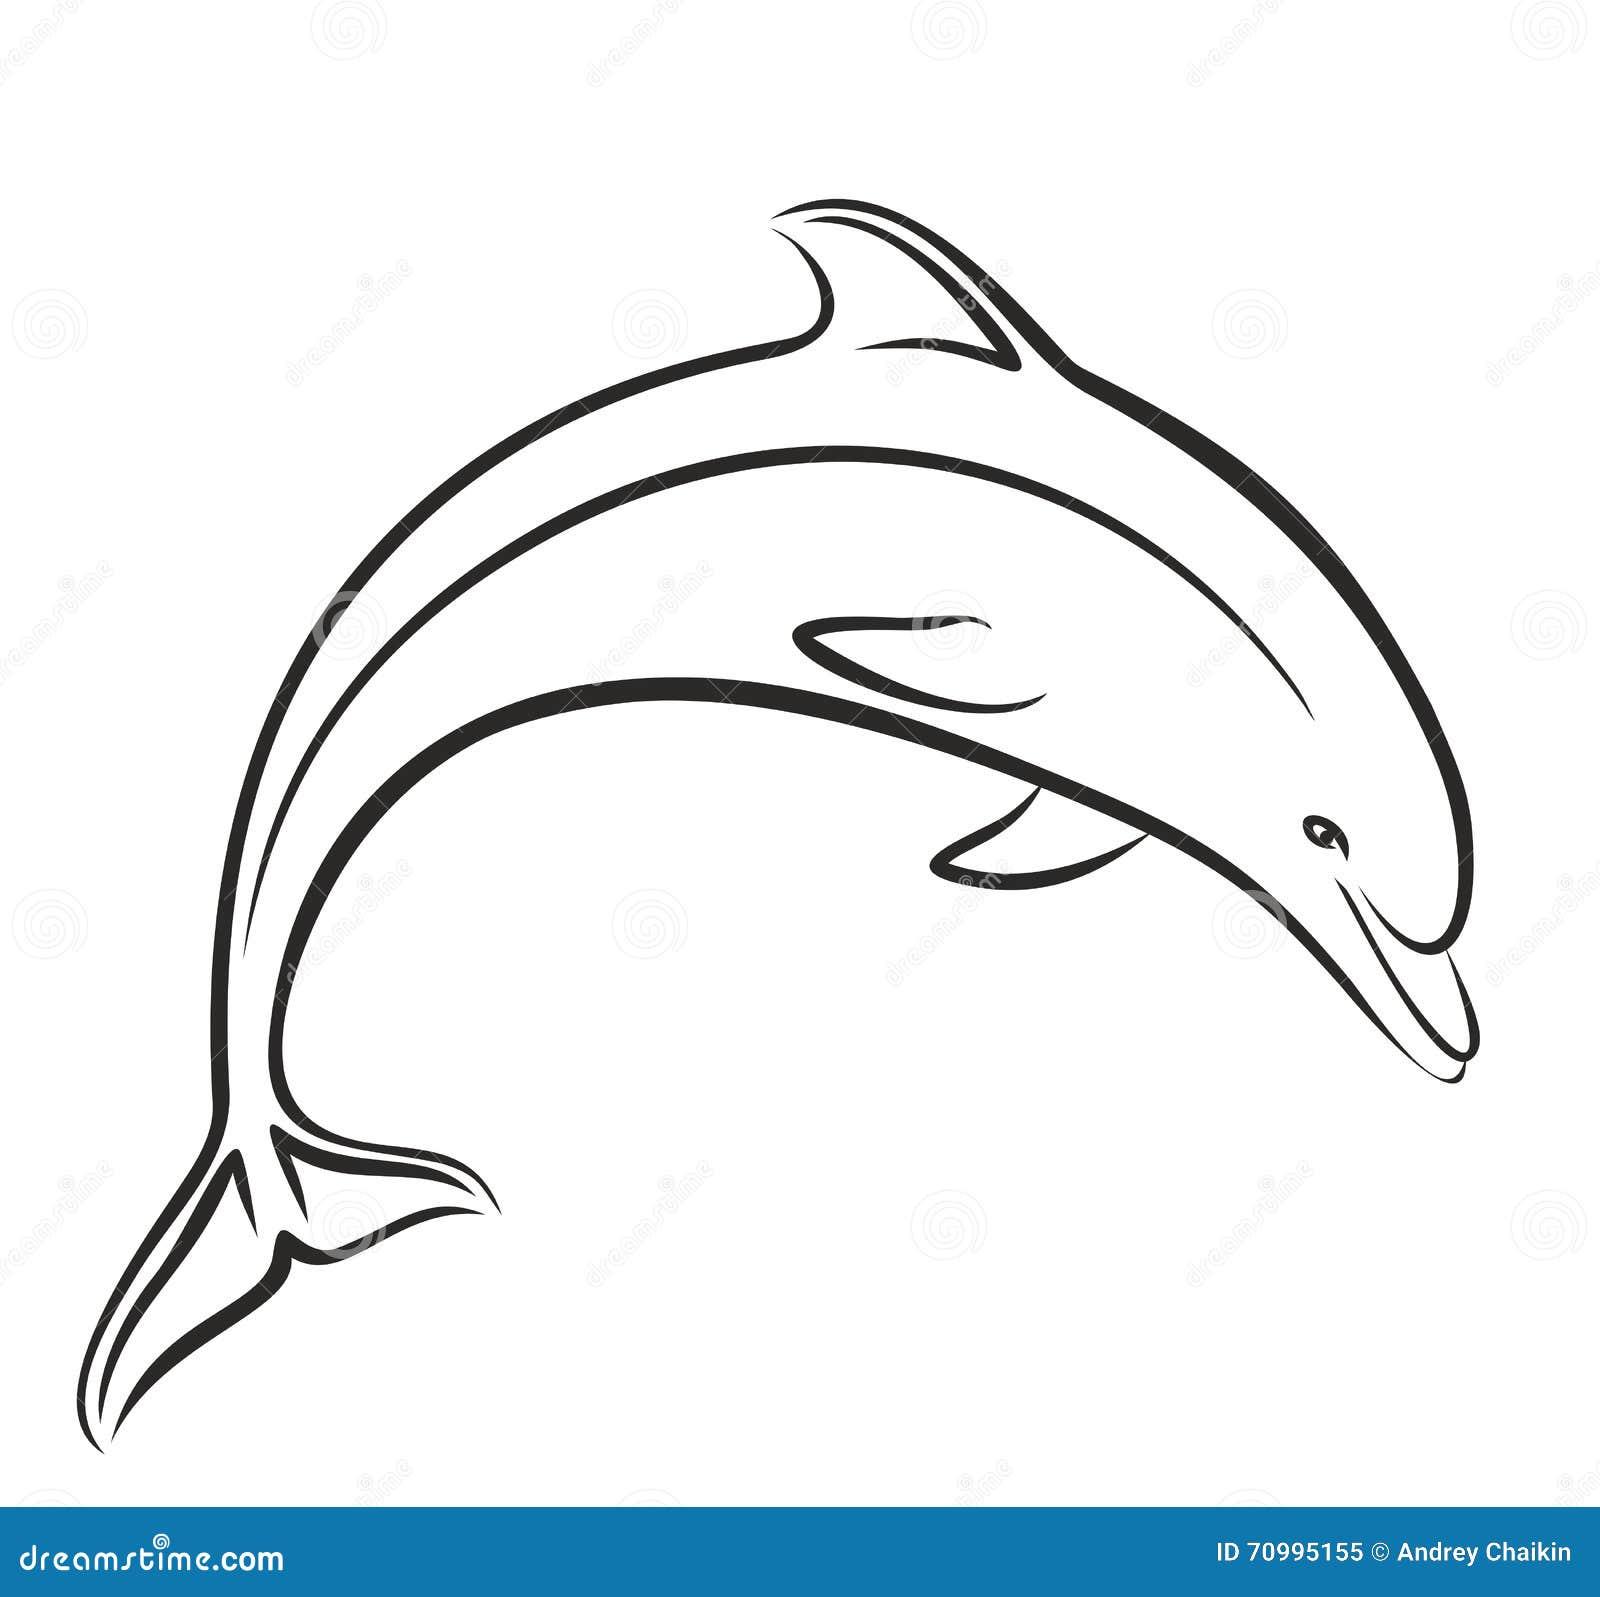 Sea Animals Tattoo Designs